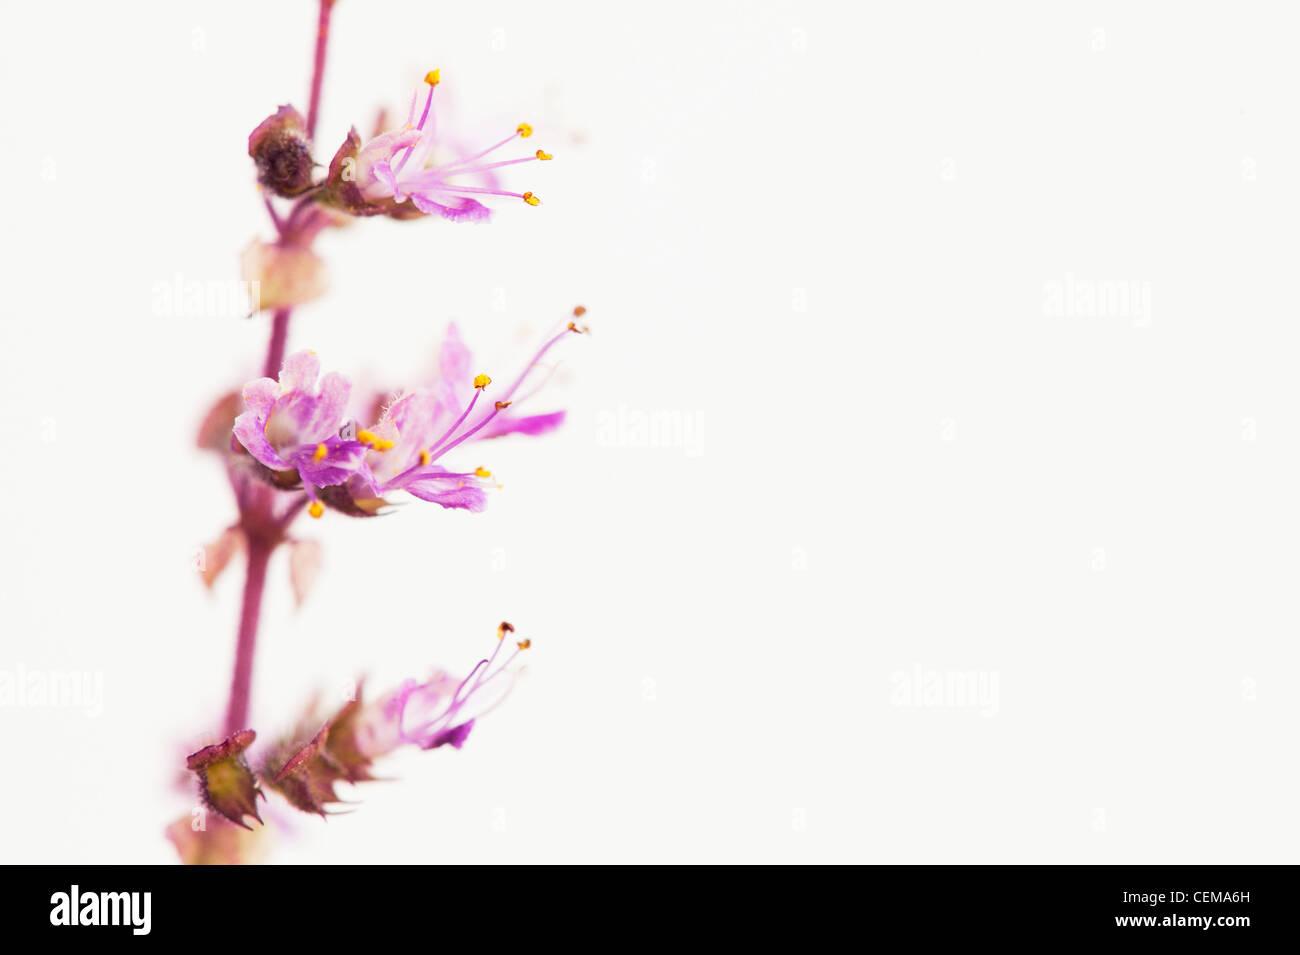 Ocimum tenuiflorum. Holy Basil, Tulsi plant and flowers on white background - Stock Image